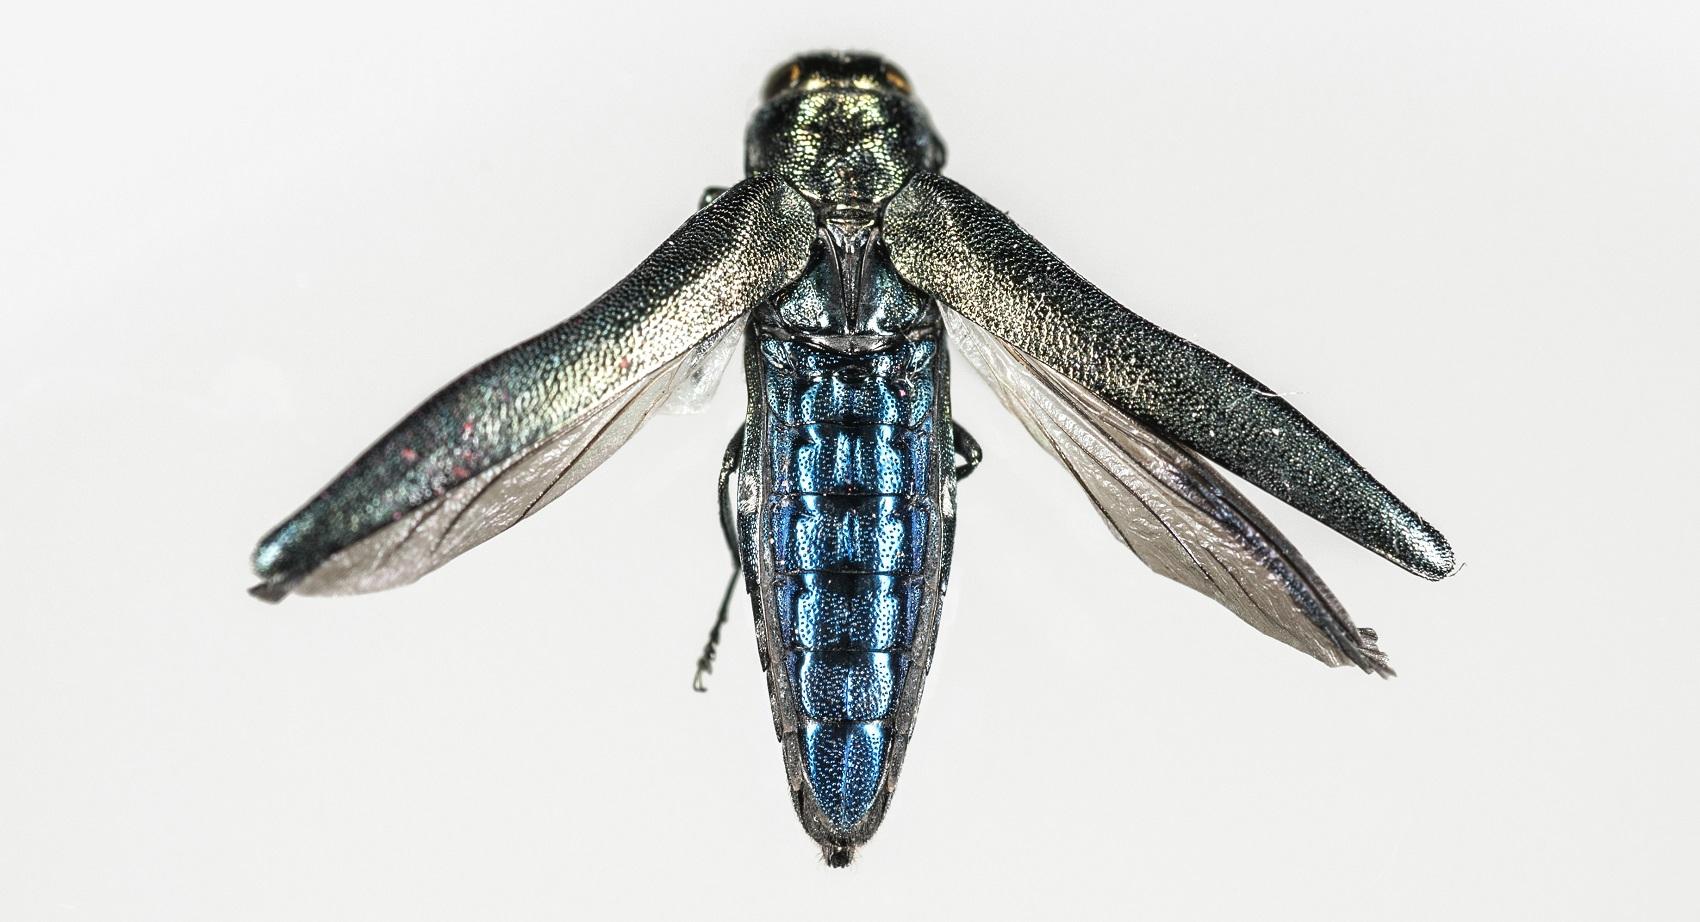 Agrilus_biguttatus_oak_buprestid_beetle- copyright Rothamsted Research